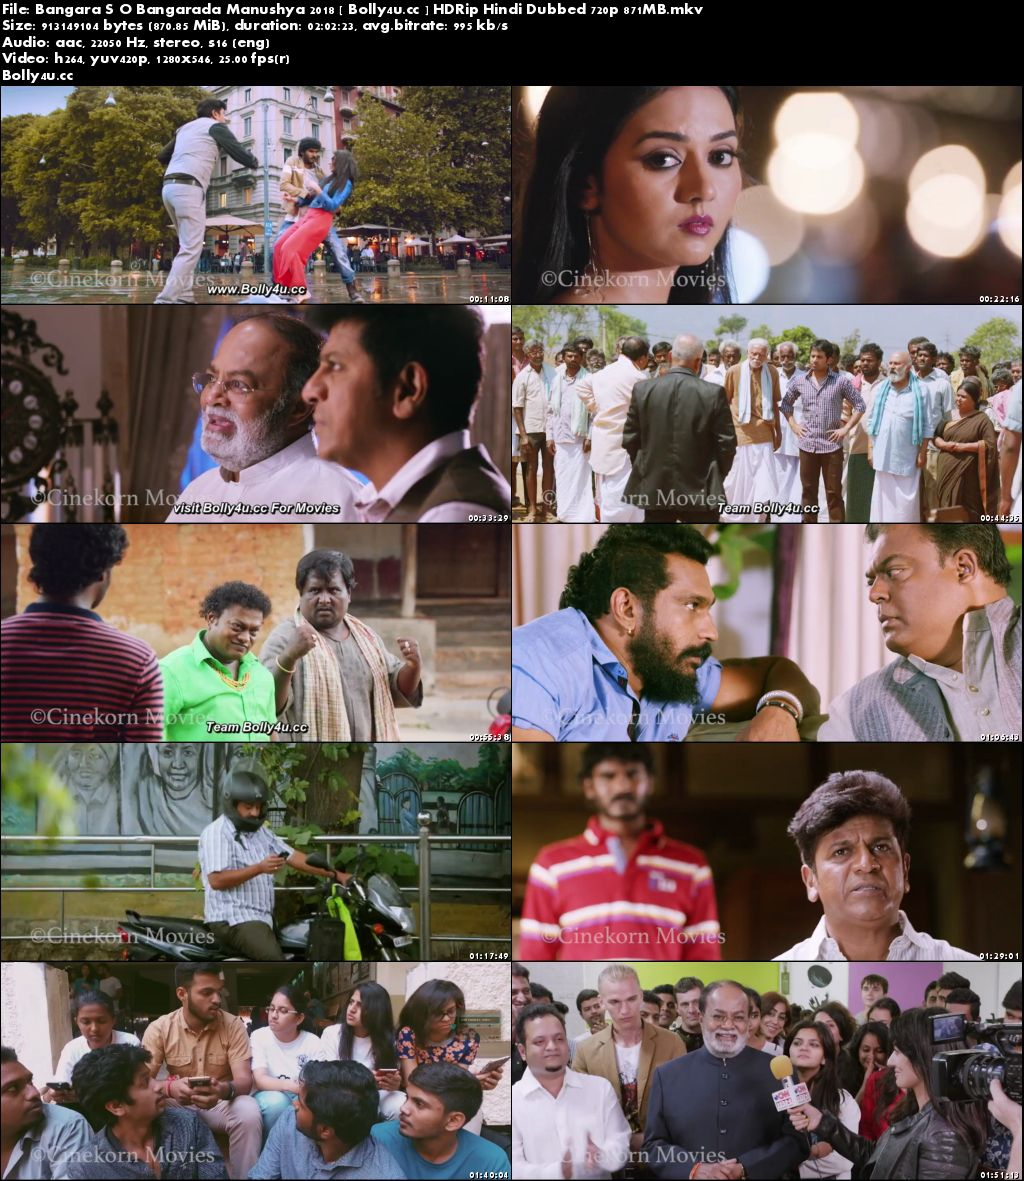 Bangara S/O Bangarada Manushya 2018 HDRip 350MB Hindi Dubbed 480p Download